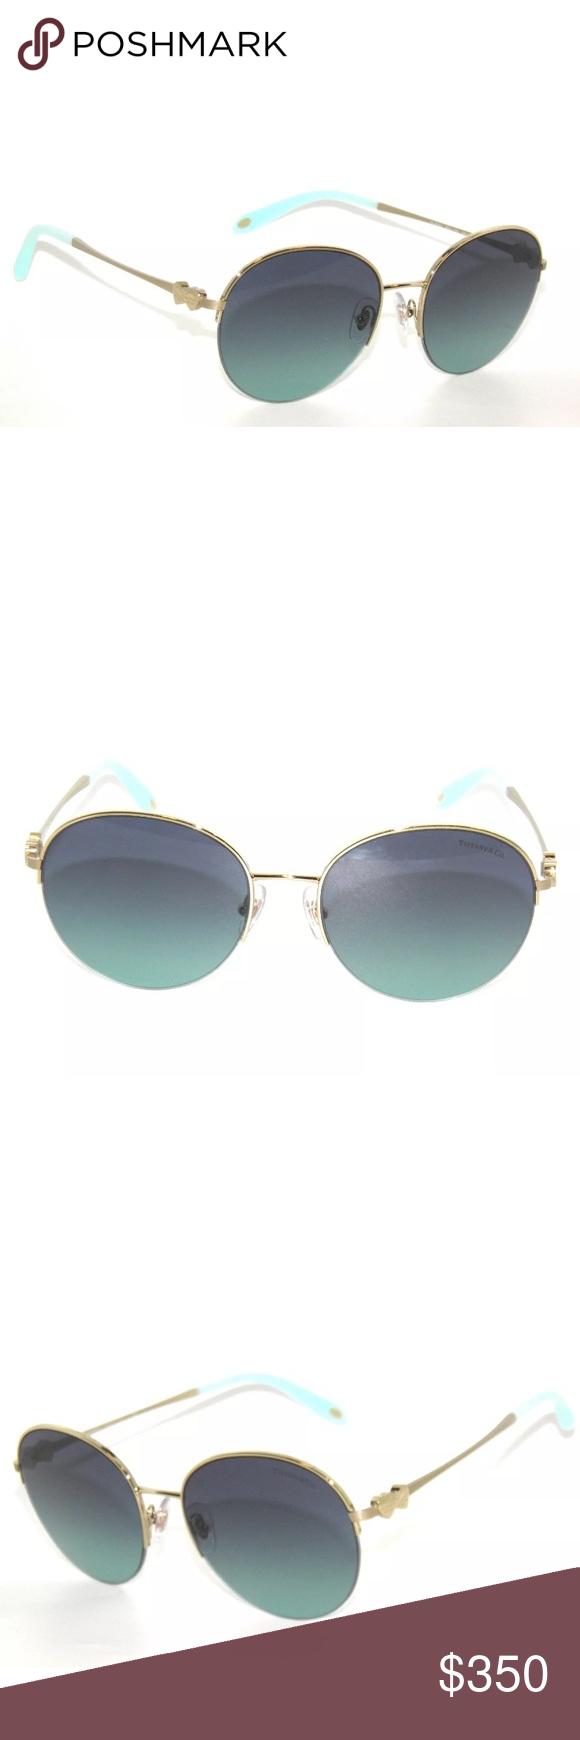 0d3e0621808e Brand new Tiffany   Co 3053 Pale Gold Brand New Comes with Tiffany case